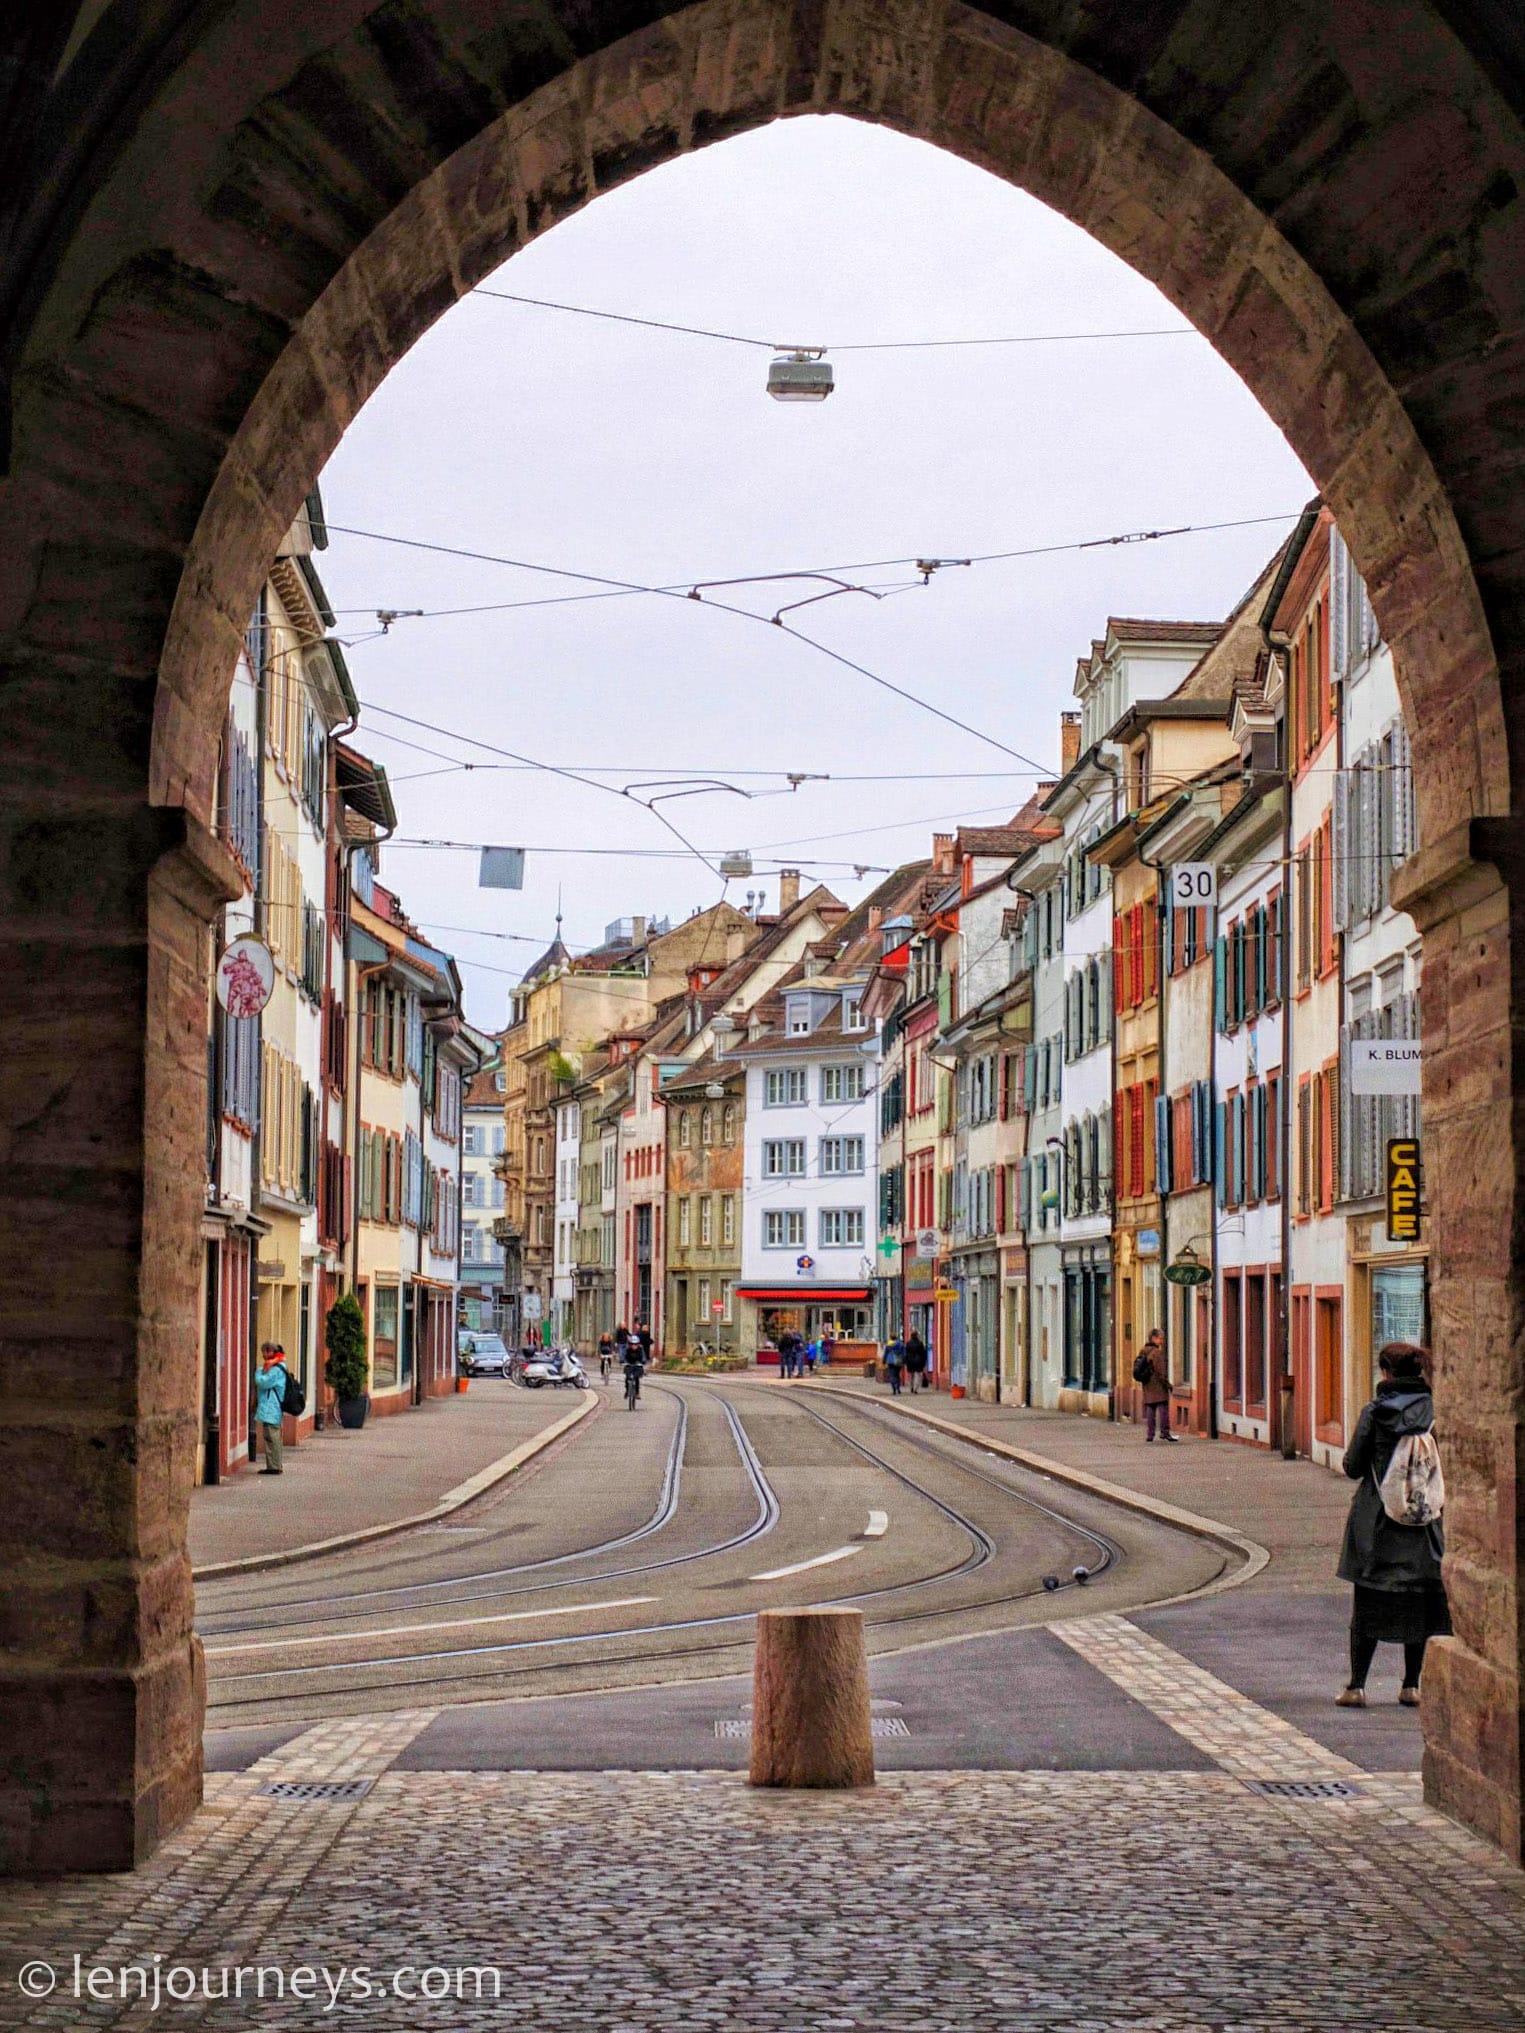 Spalentor - a maginificent city gate